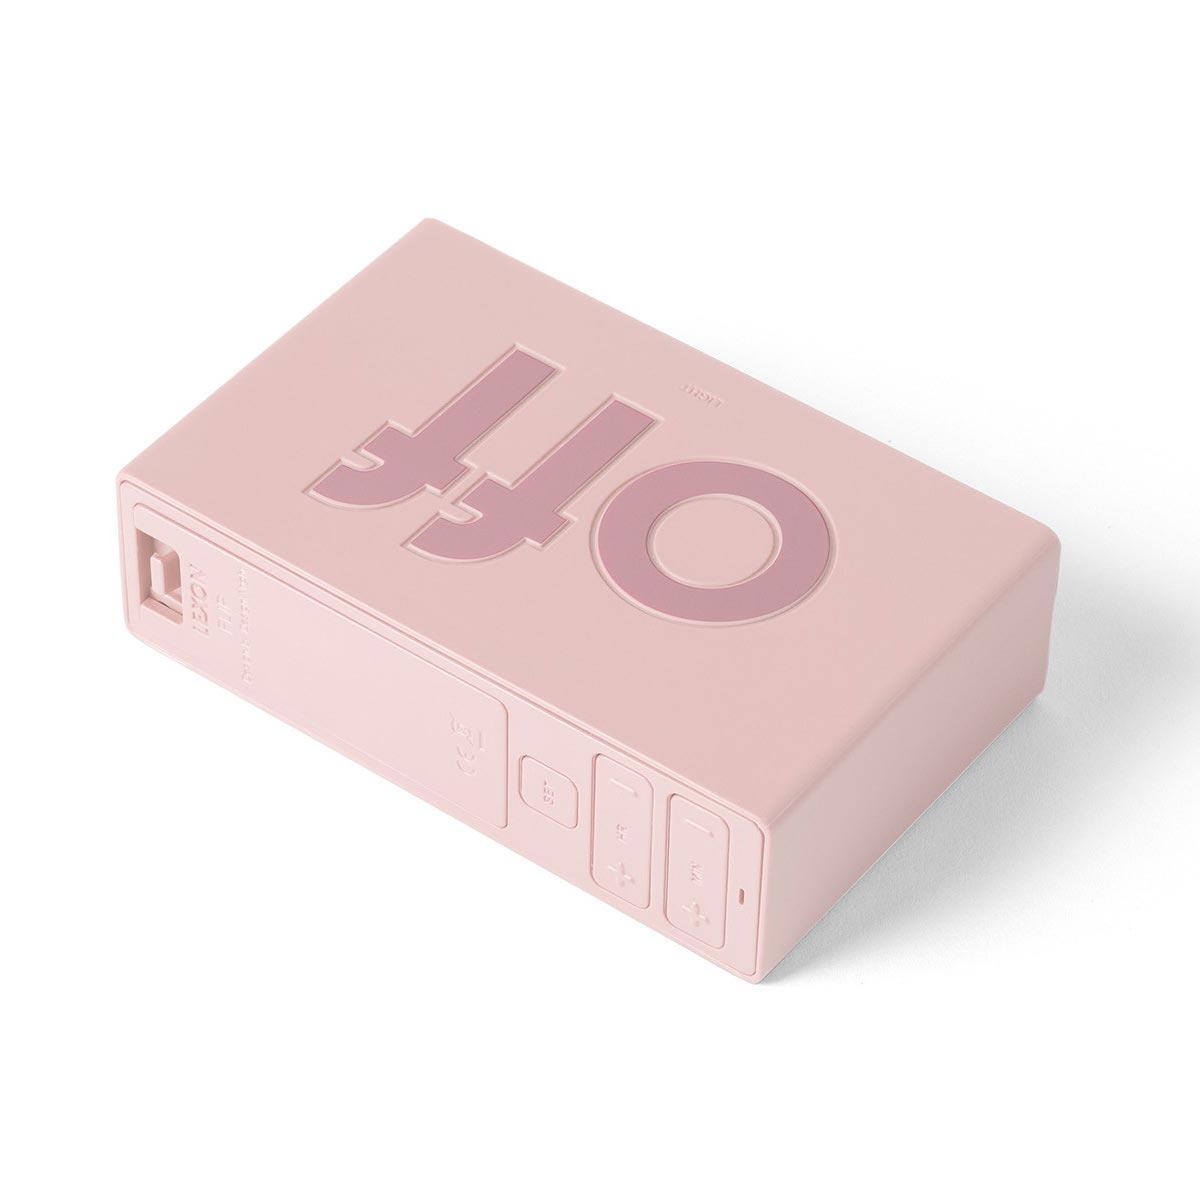 LEXON Flip LCD alarm clock LR130P8 pink | The Design Gift Shop